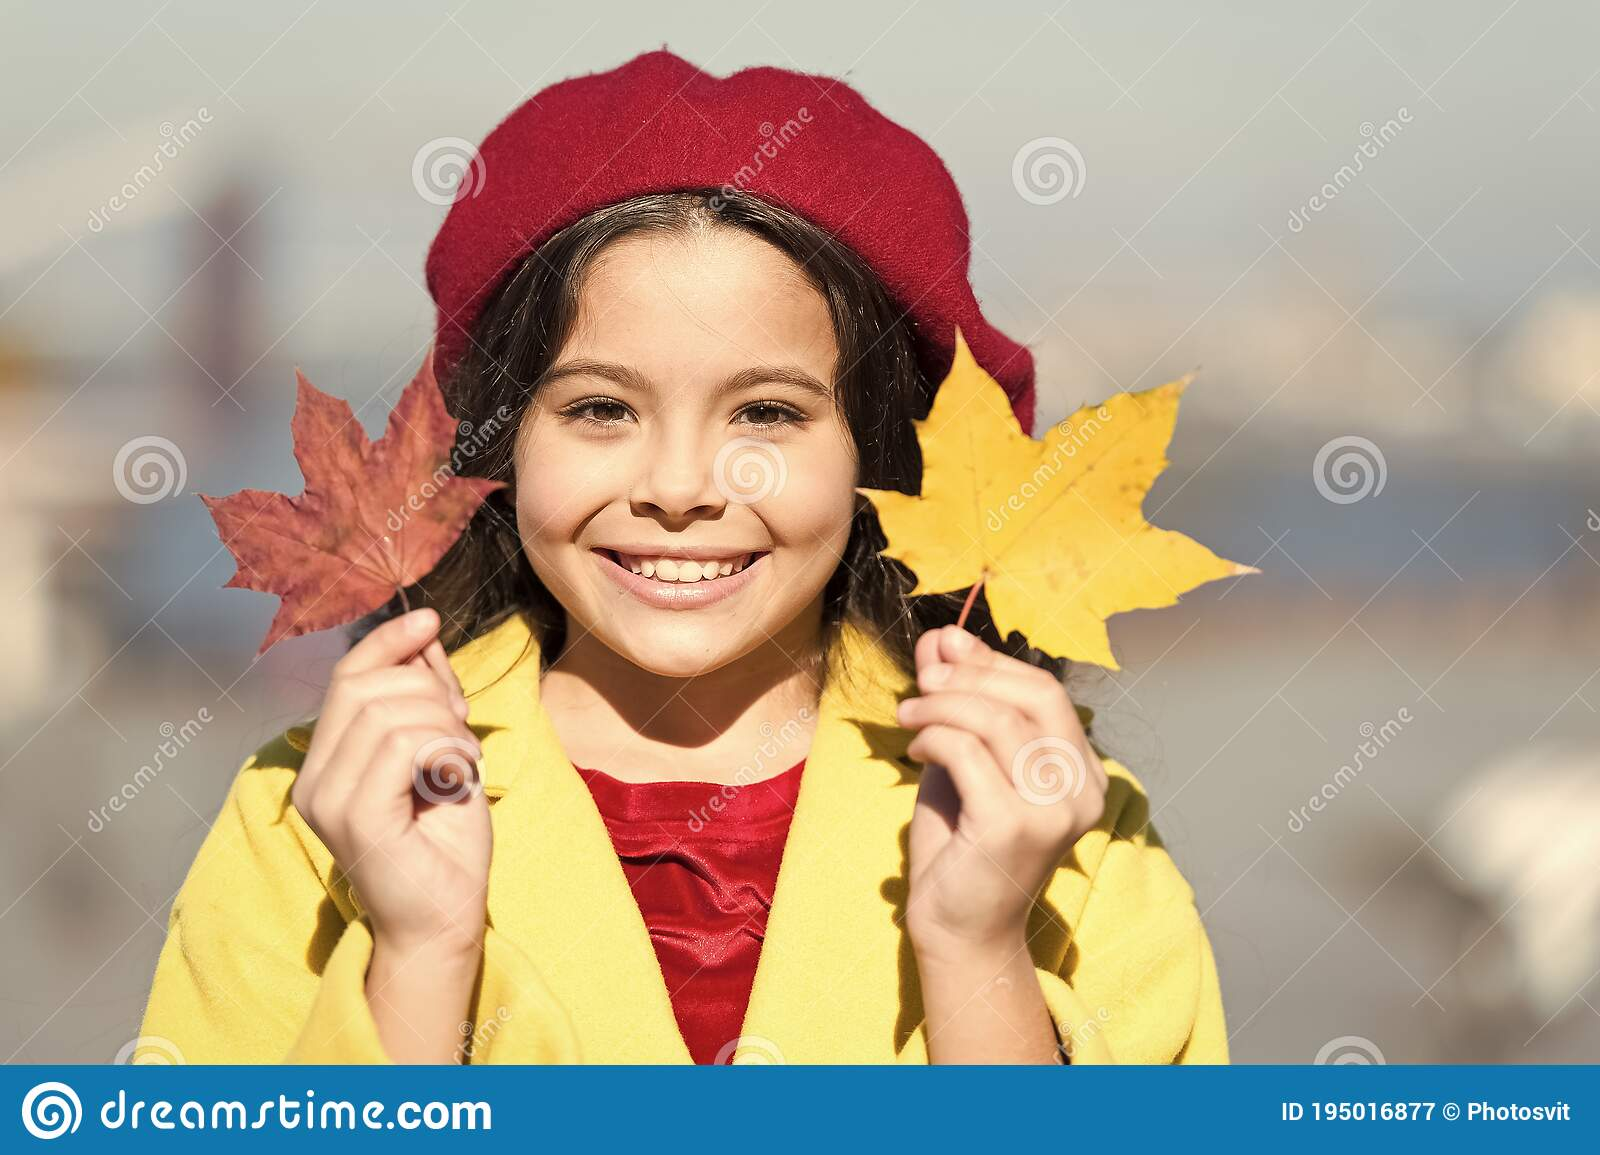 So Beautiful. Autumn Kid Fashion. Child Maple Leaf. Kid In French ...